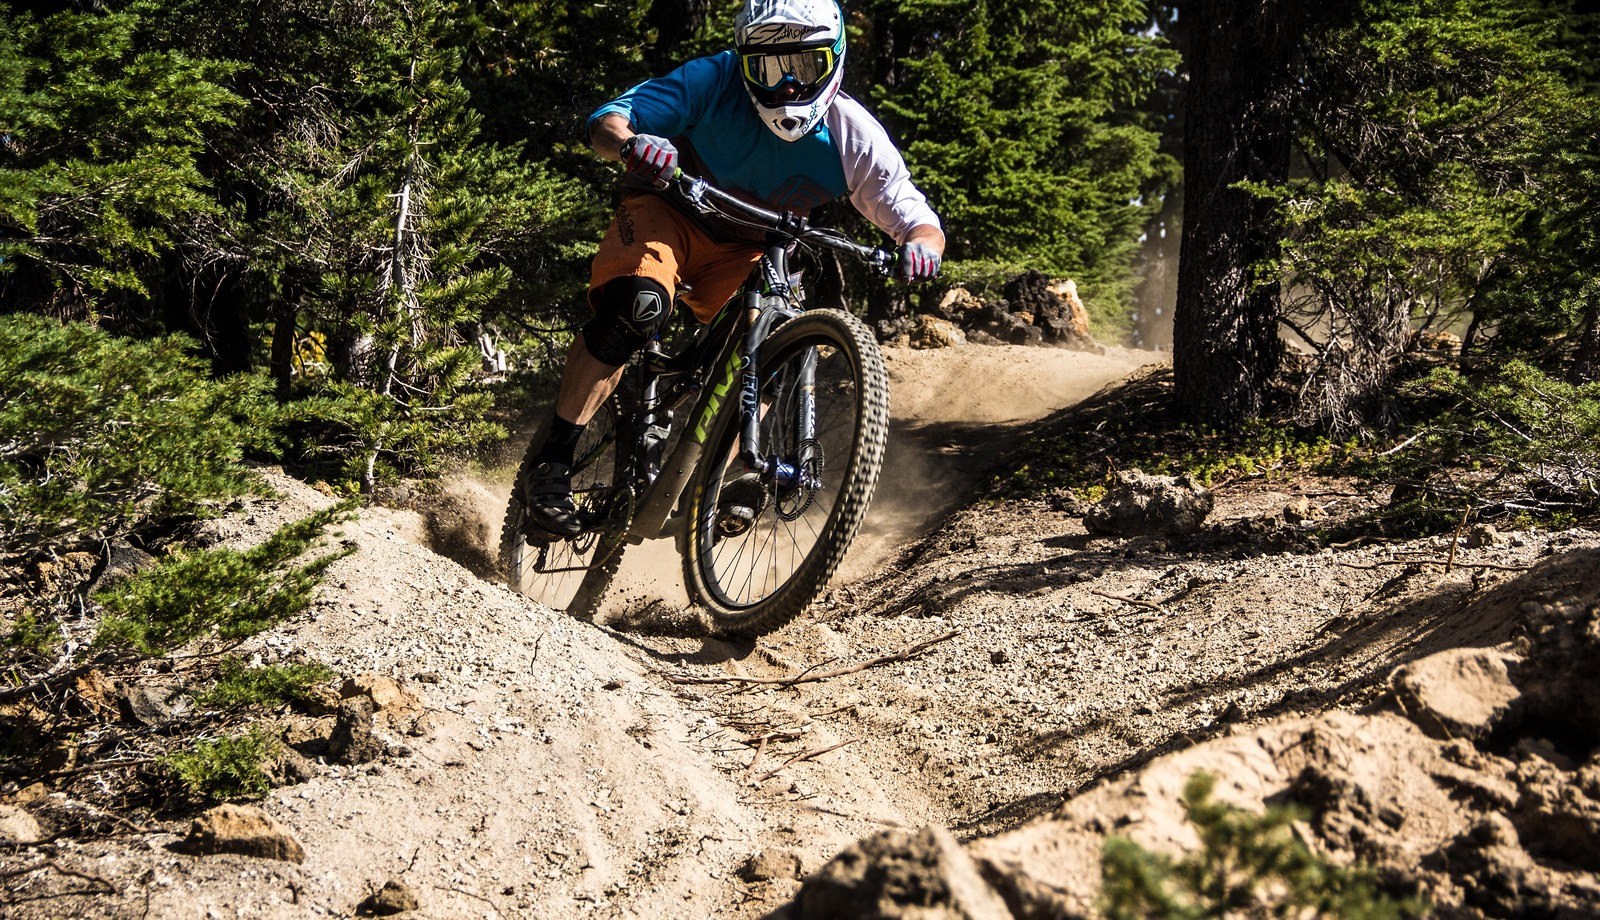 Smashin - Yuroshek - Mountain Biking Pictures - Vital MTB